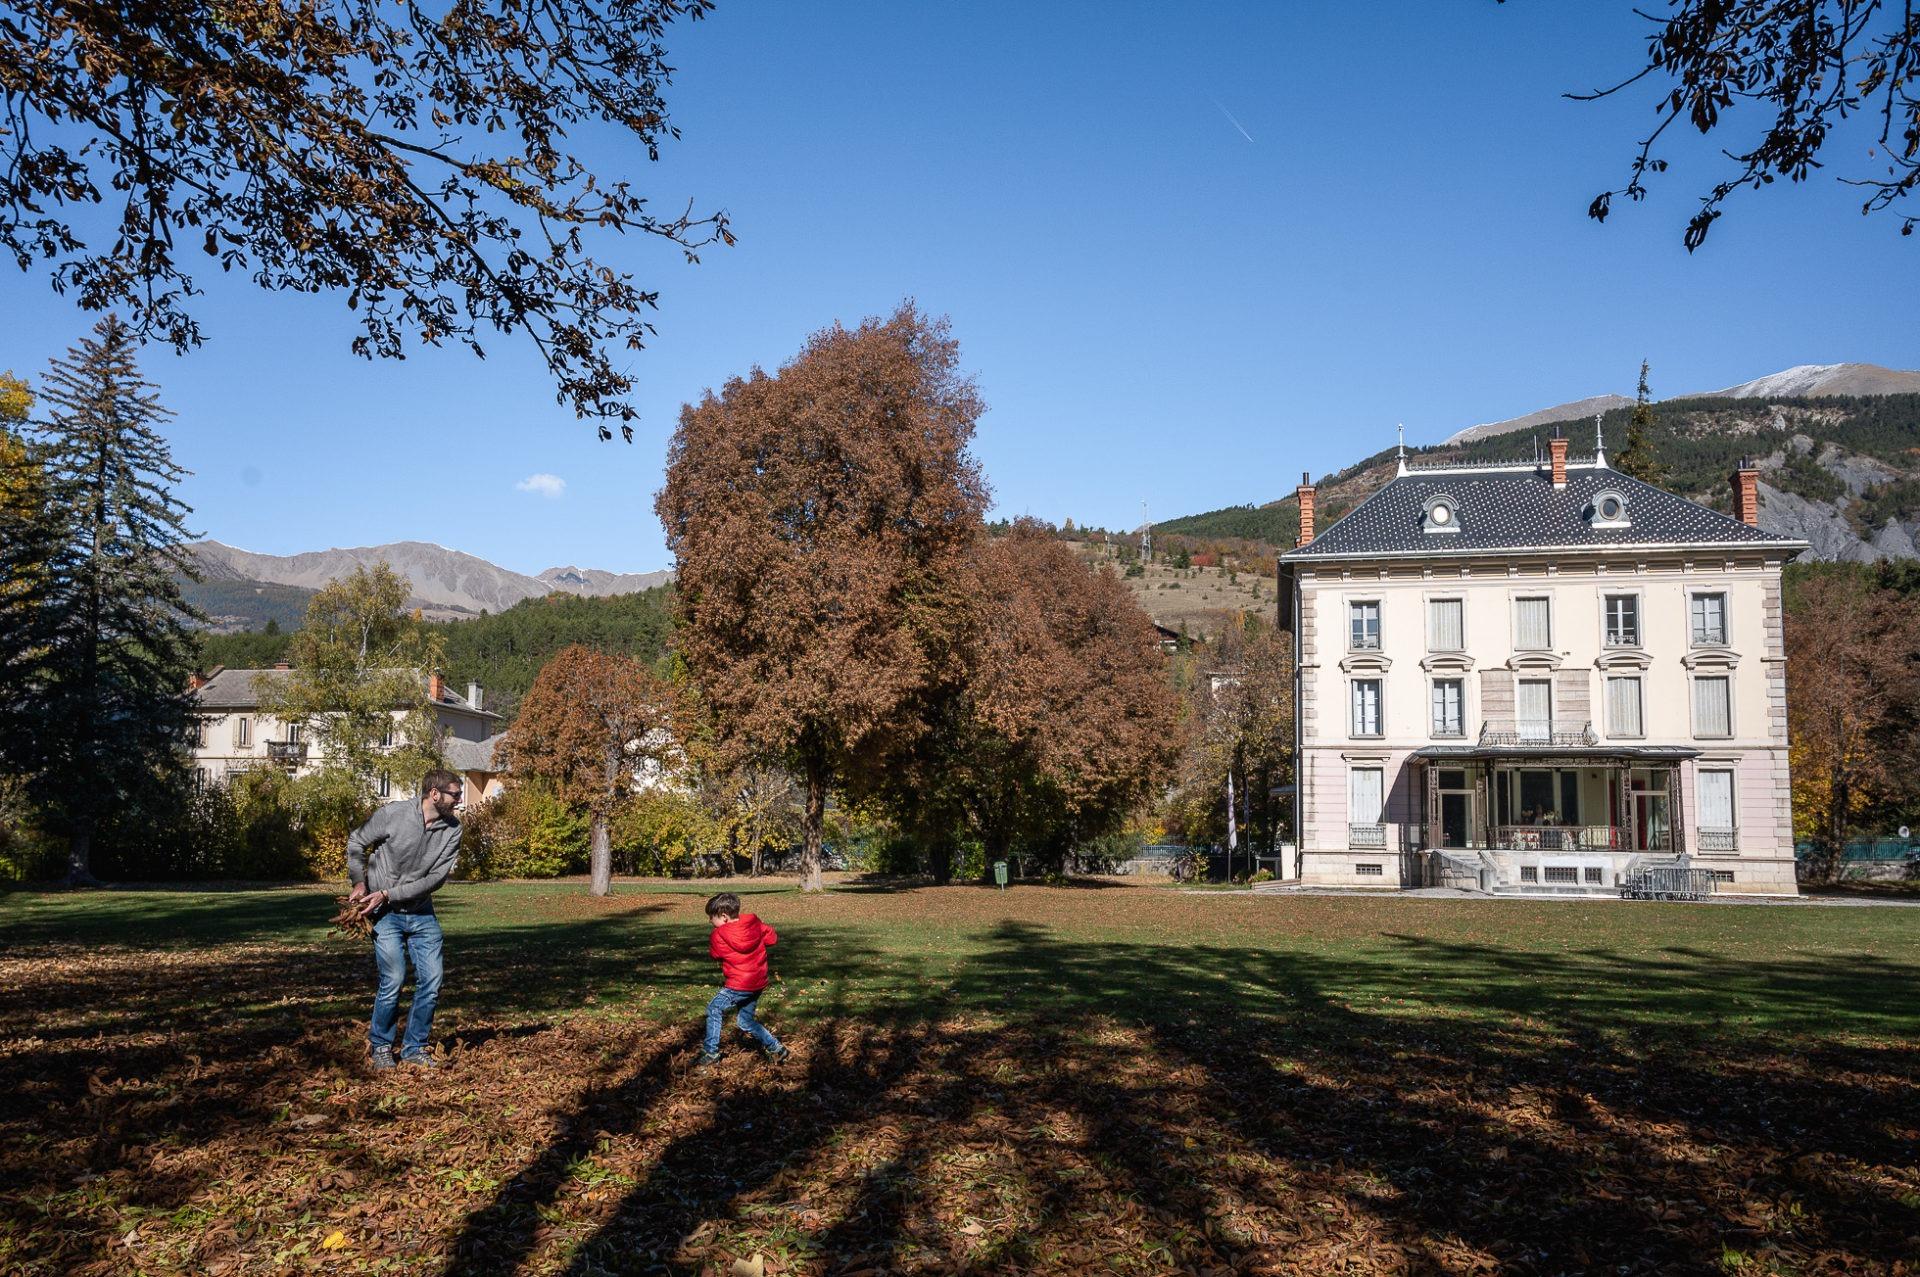 Villa mexicaine, vallée de l'Ubaye, Alpes de Haute Provence